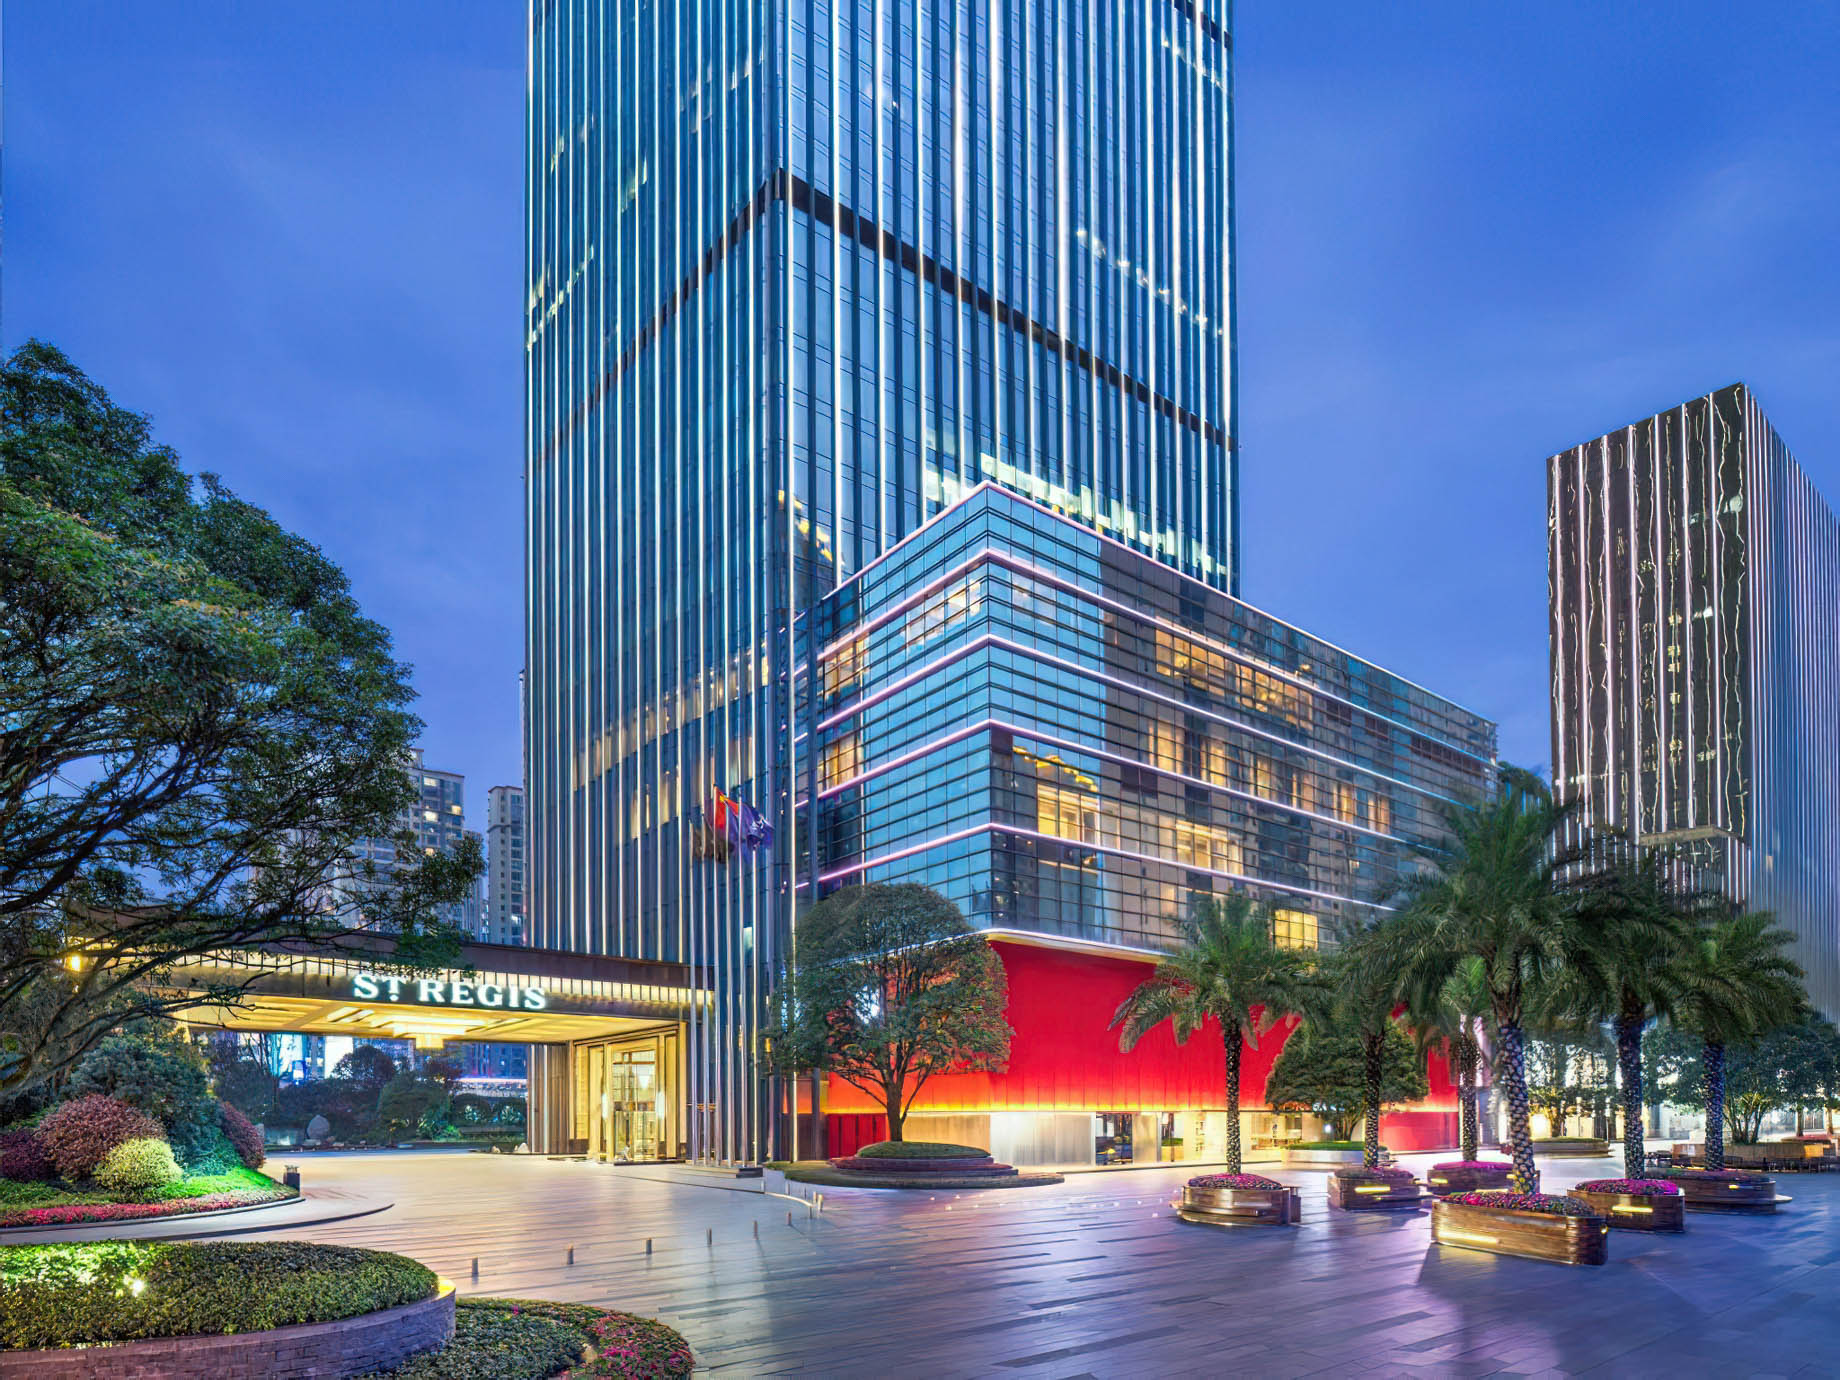 The St. Regis Changsha Luxury Hotel - Changsha, China - Hotel Exterior